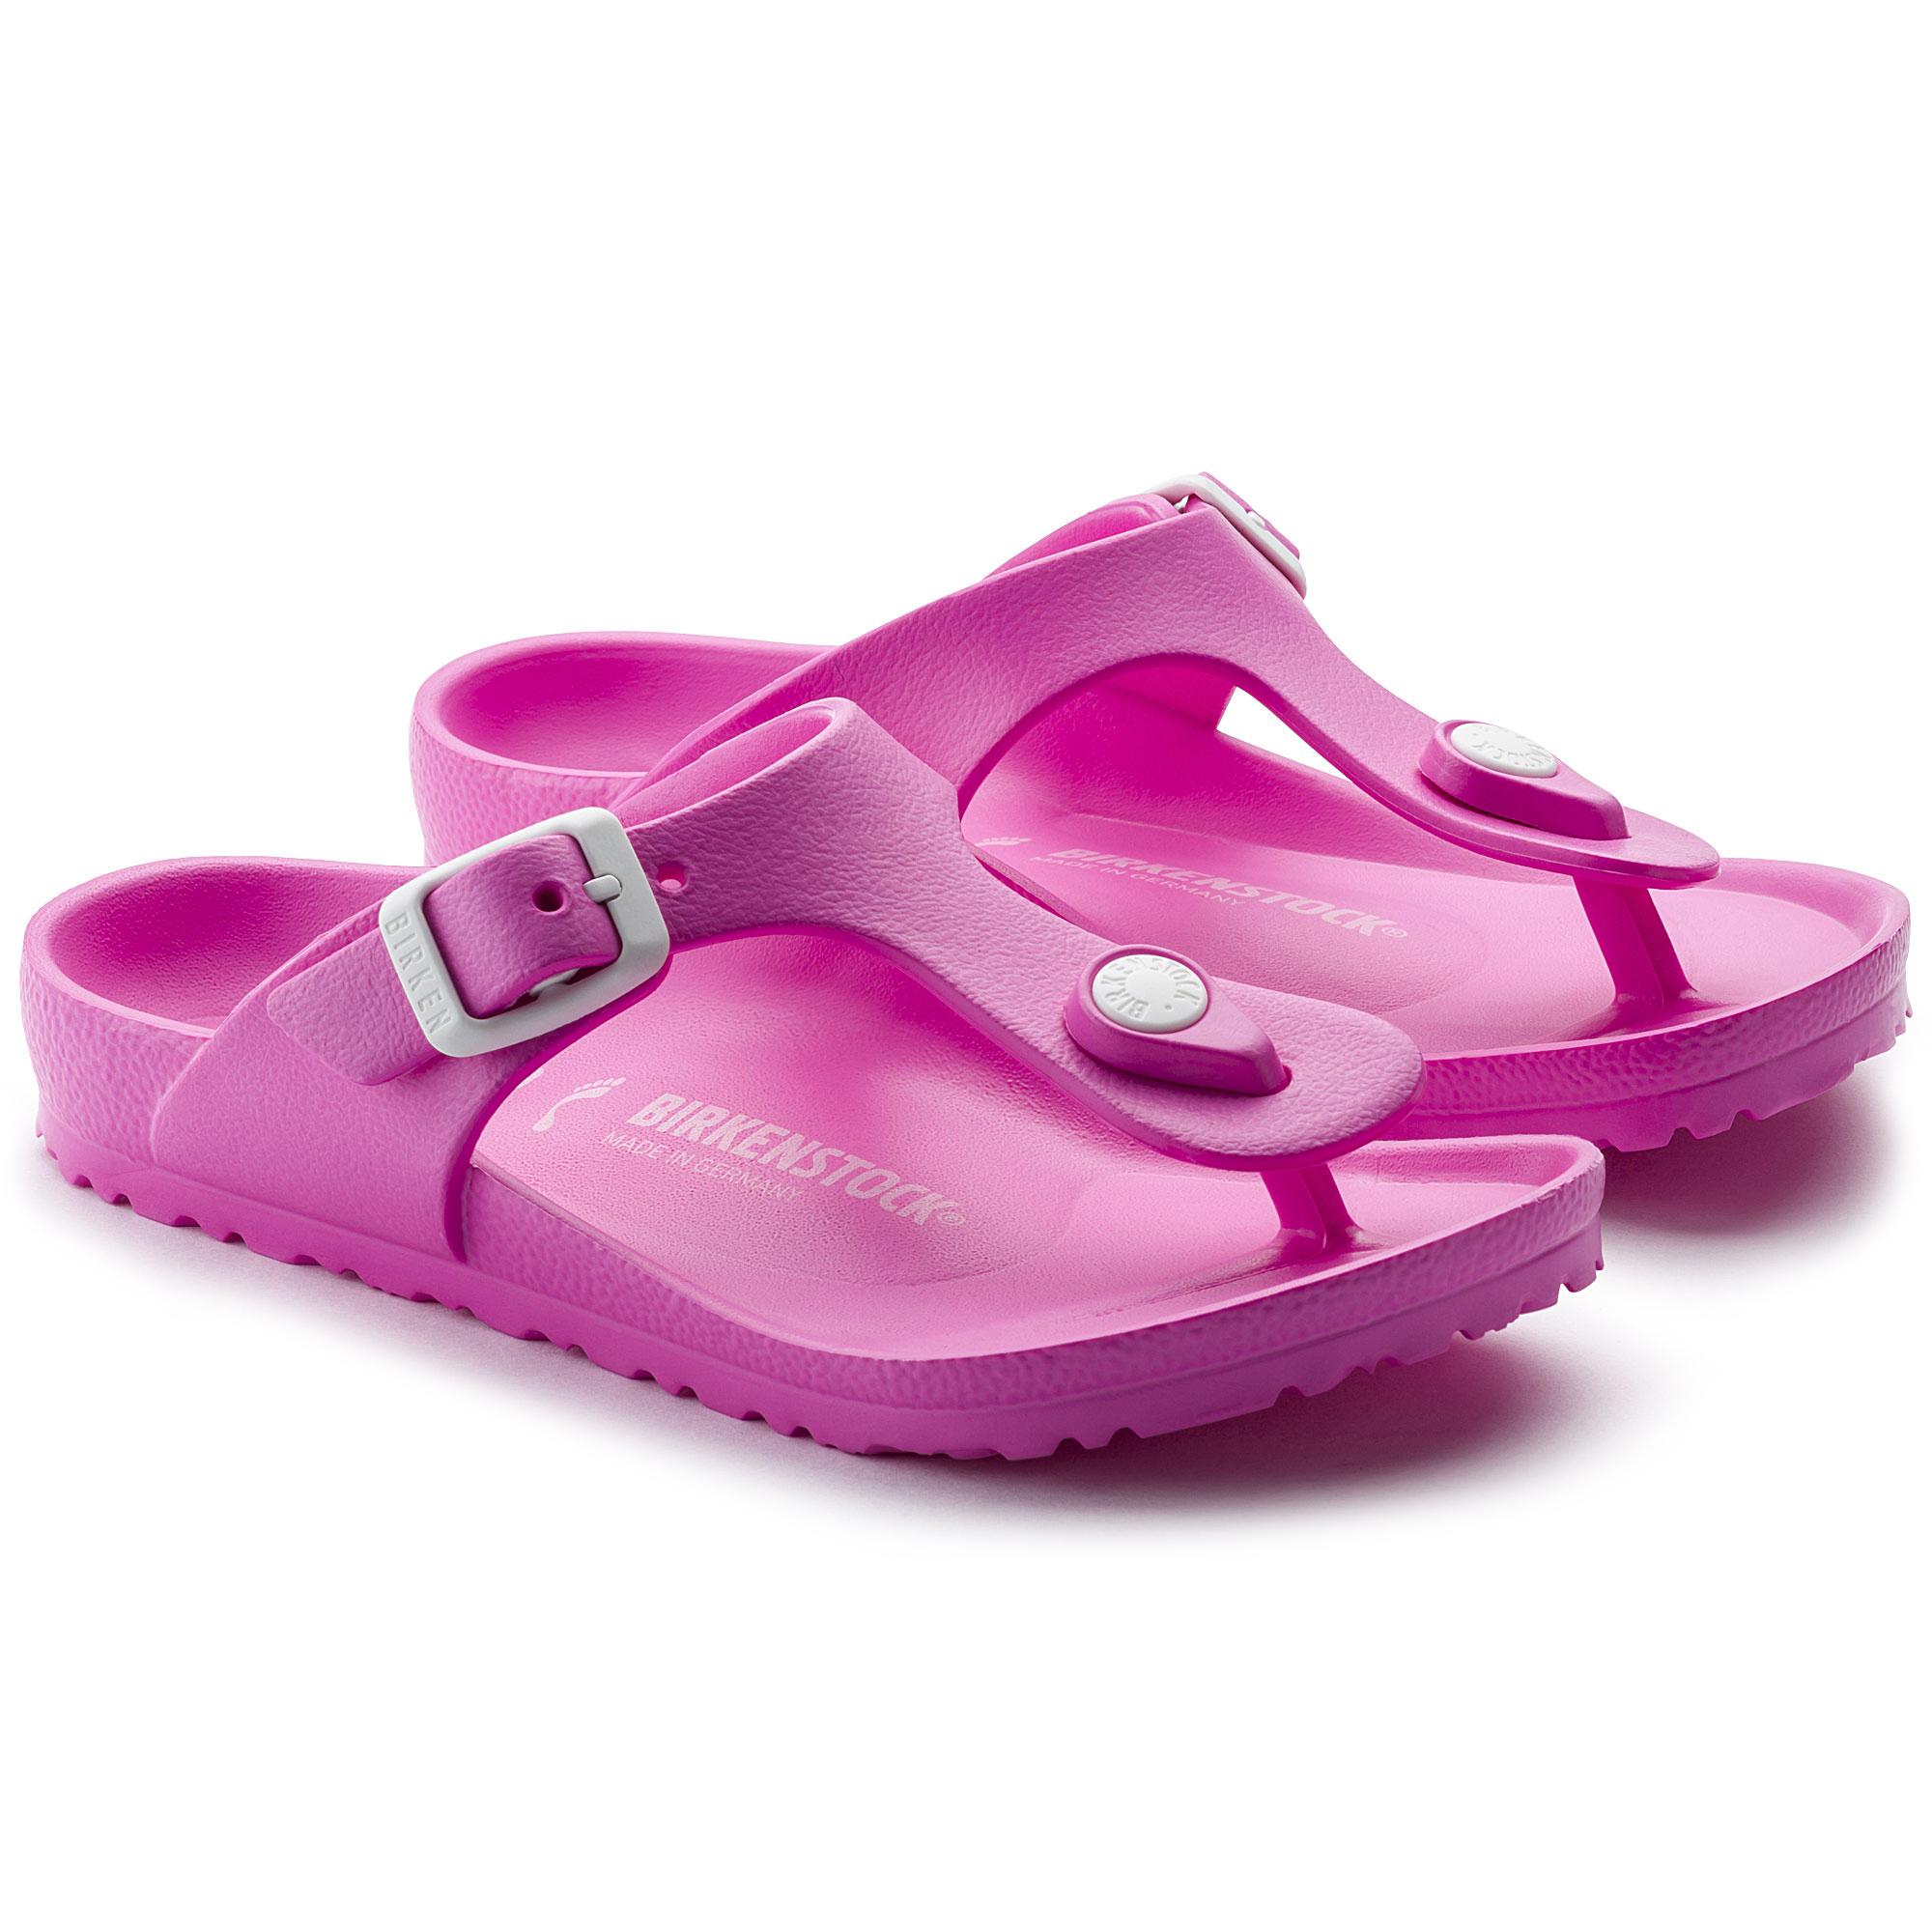 Gizeh EVA Neon Pink | shop online at